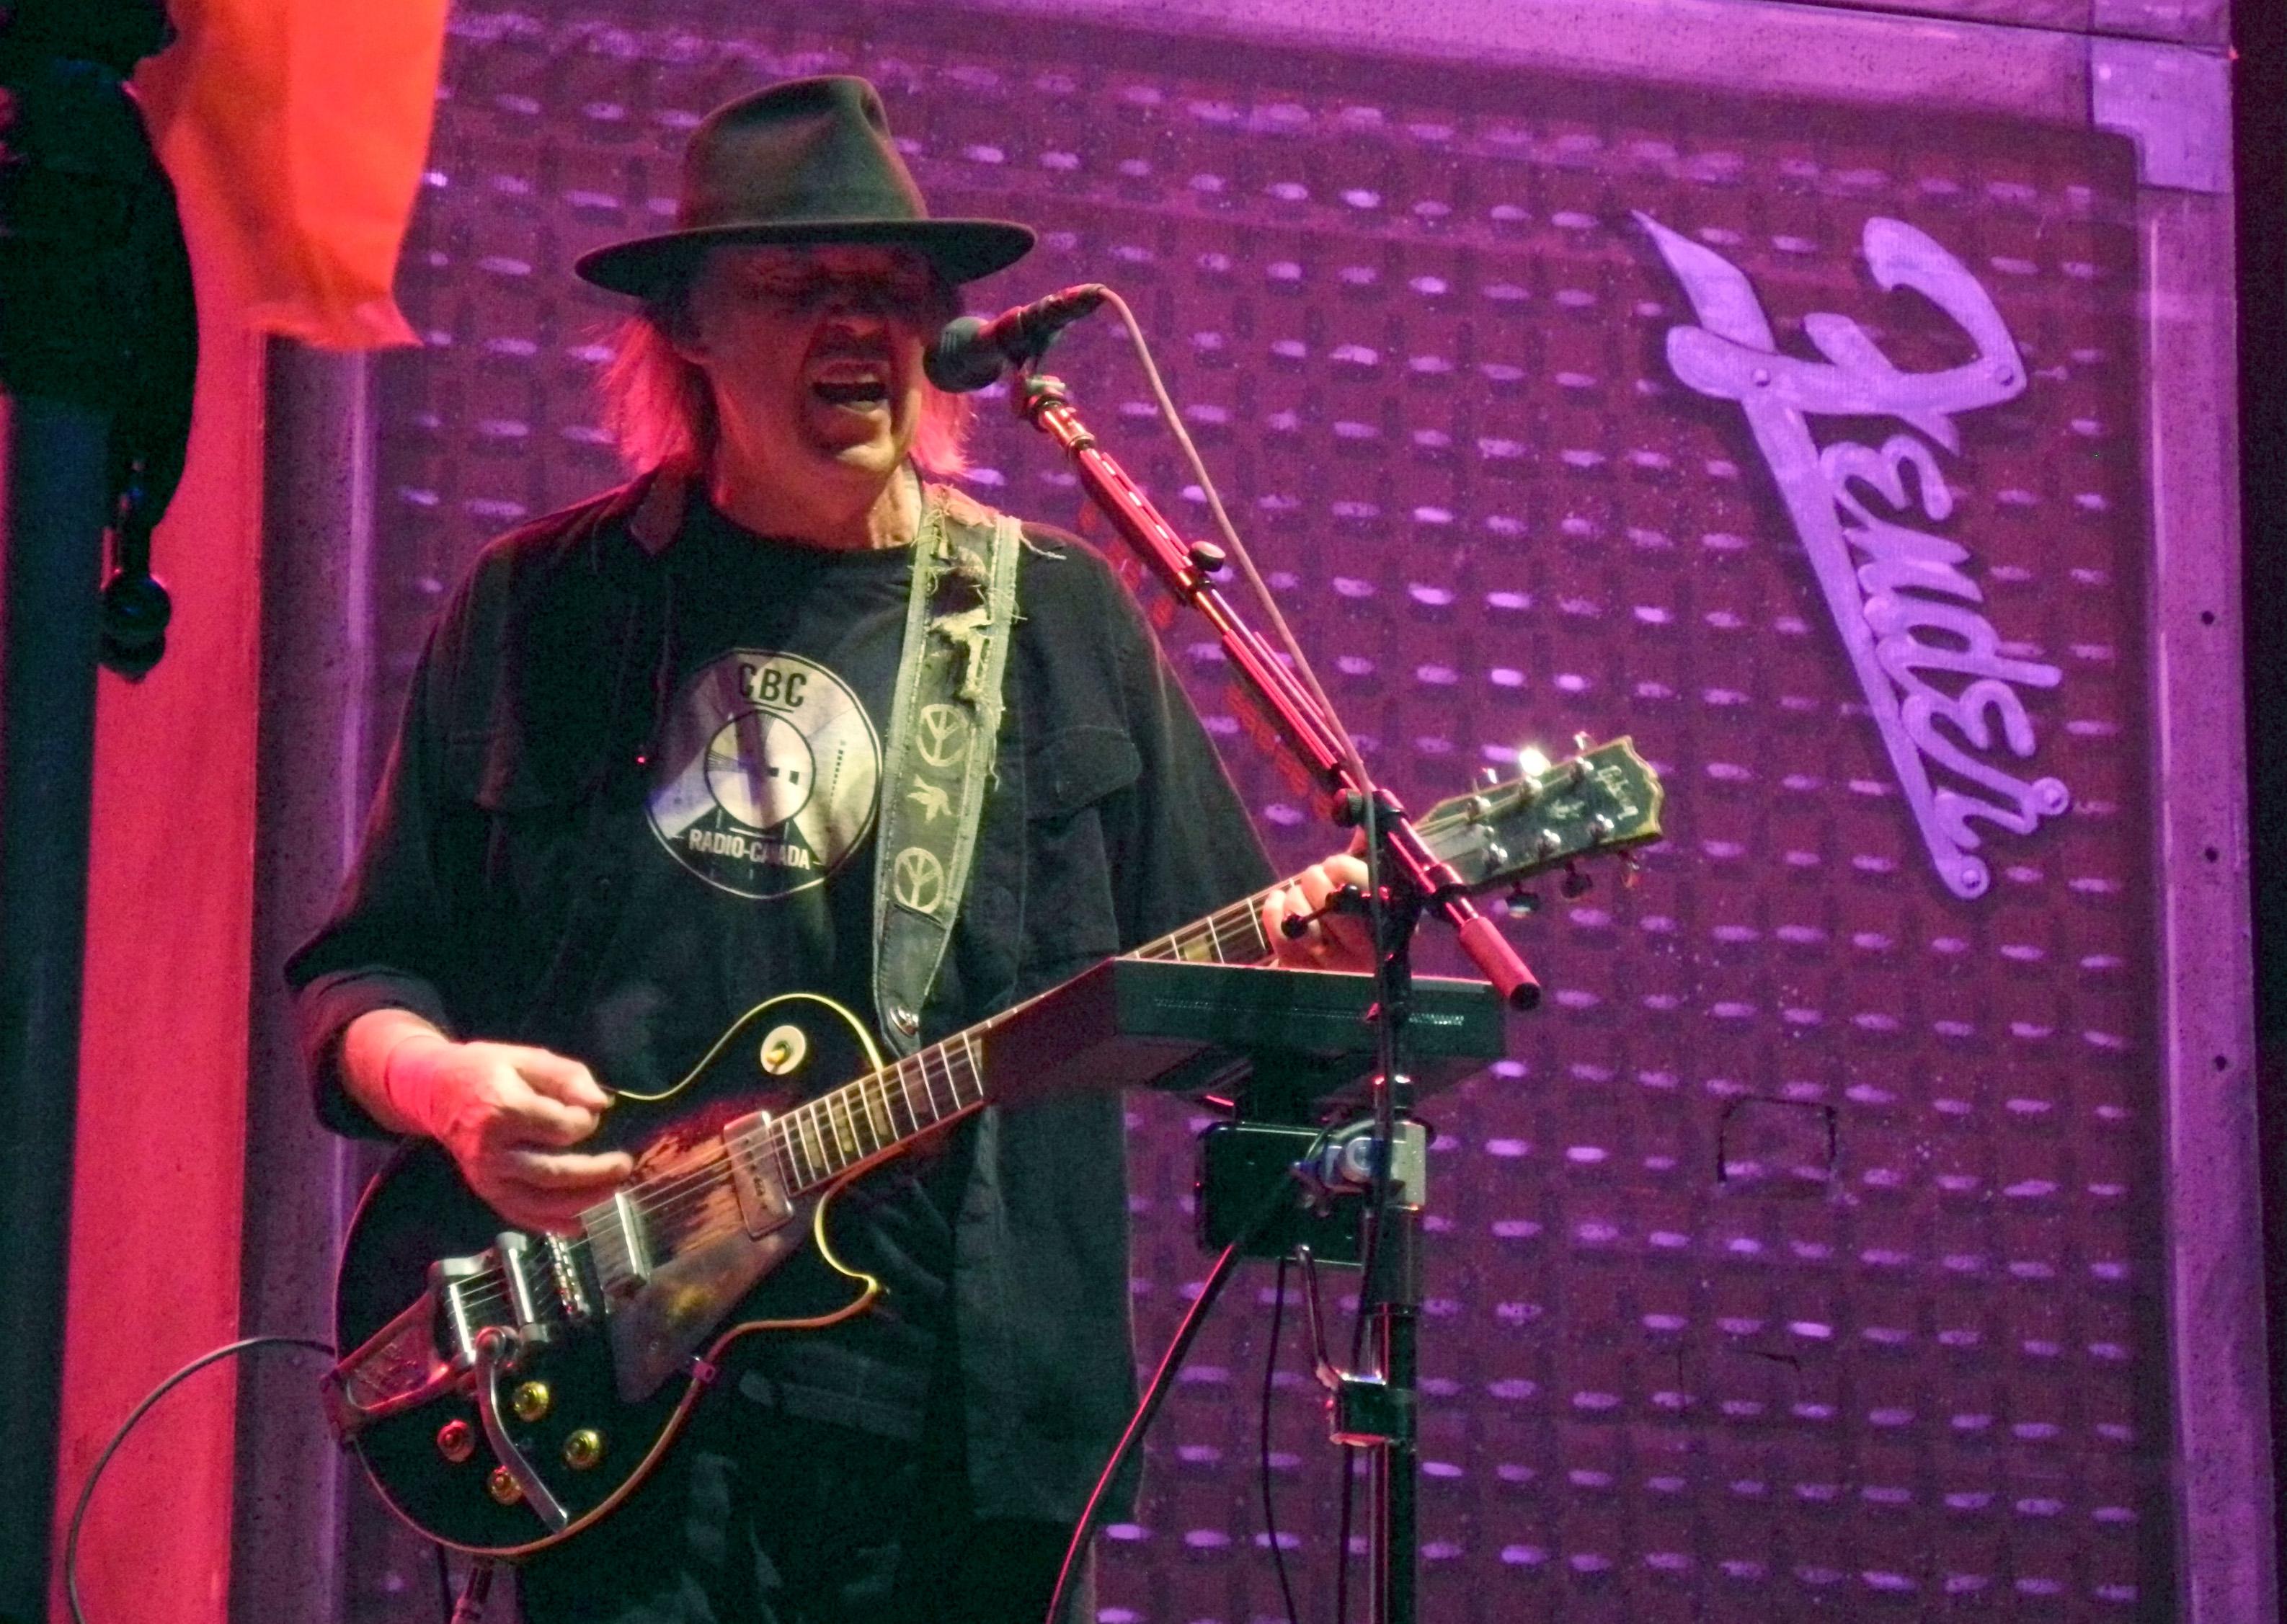 Neil Young durante la gira Alchemy Tour en 2013.